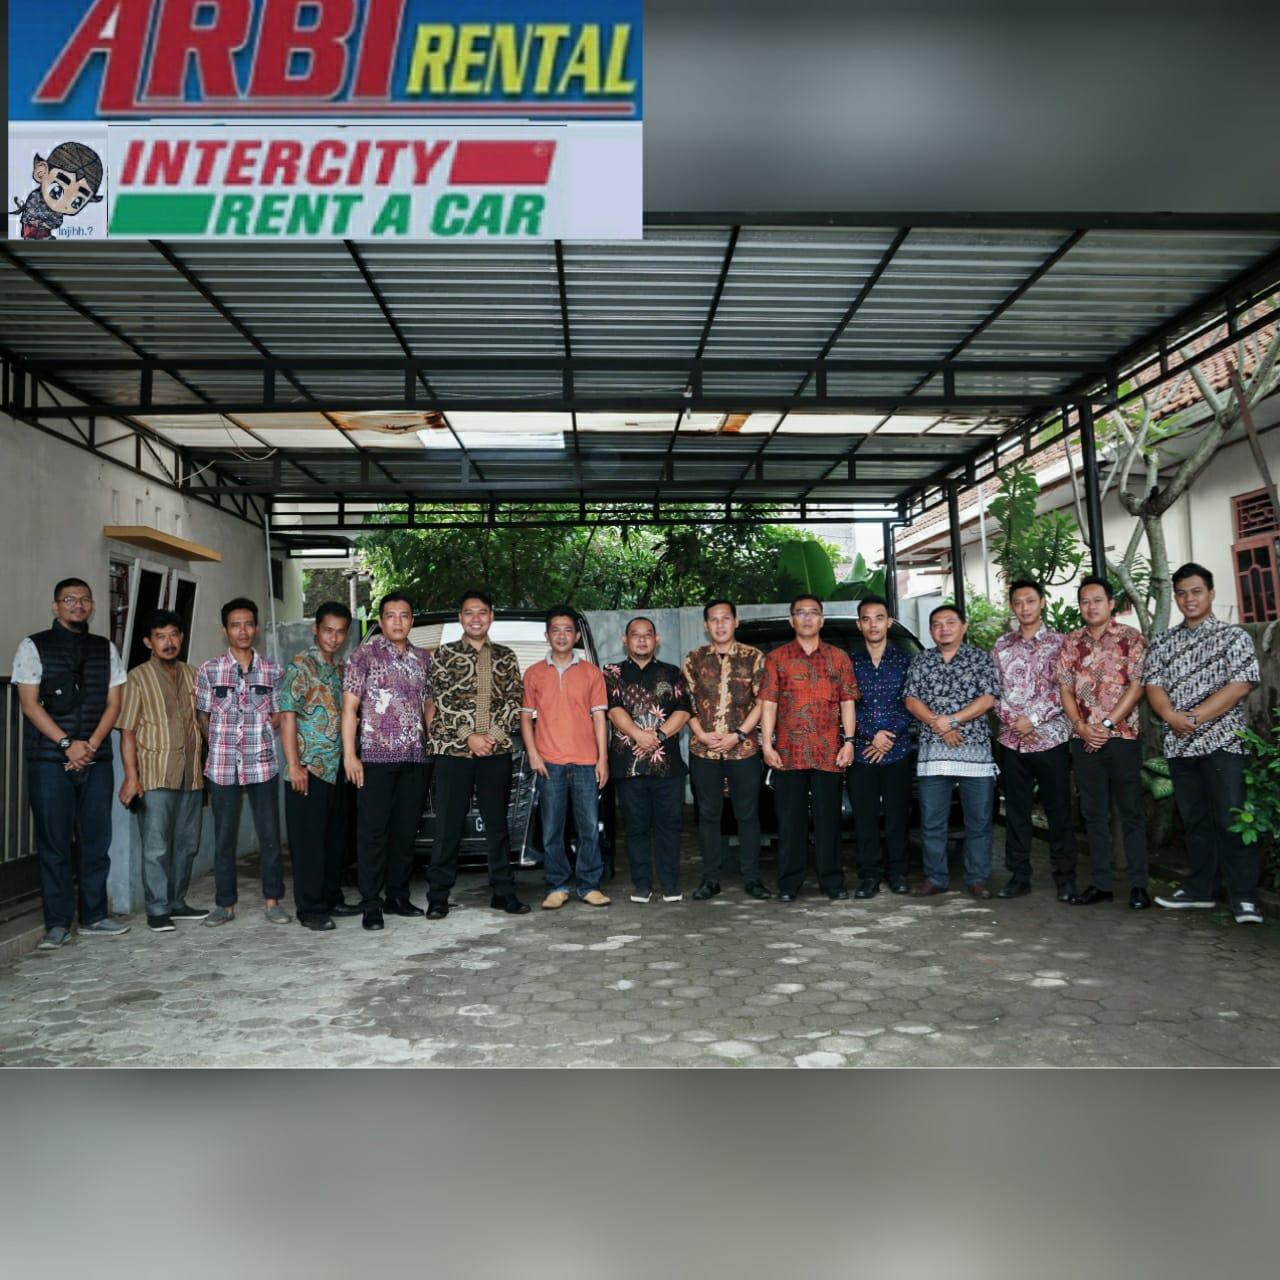 ARBI RENTAL PWT